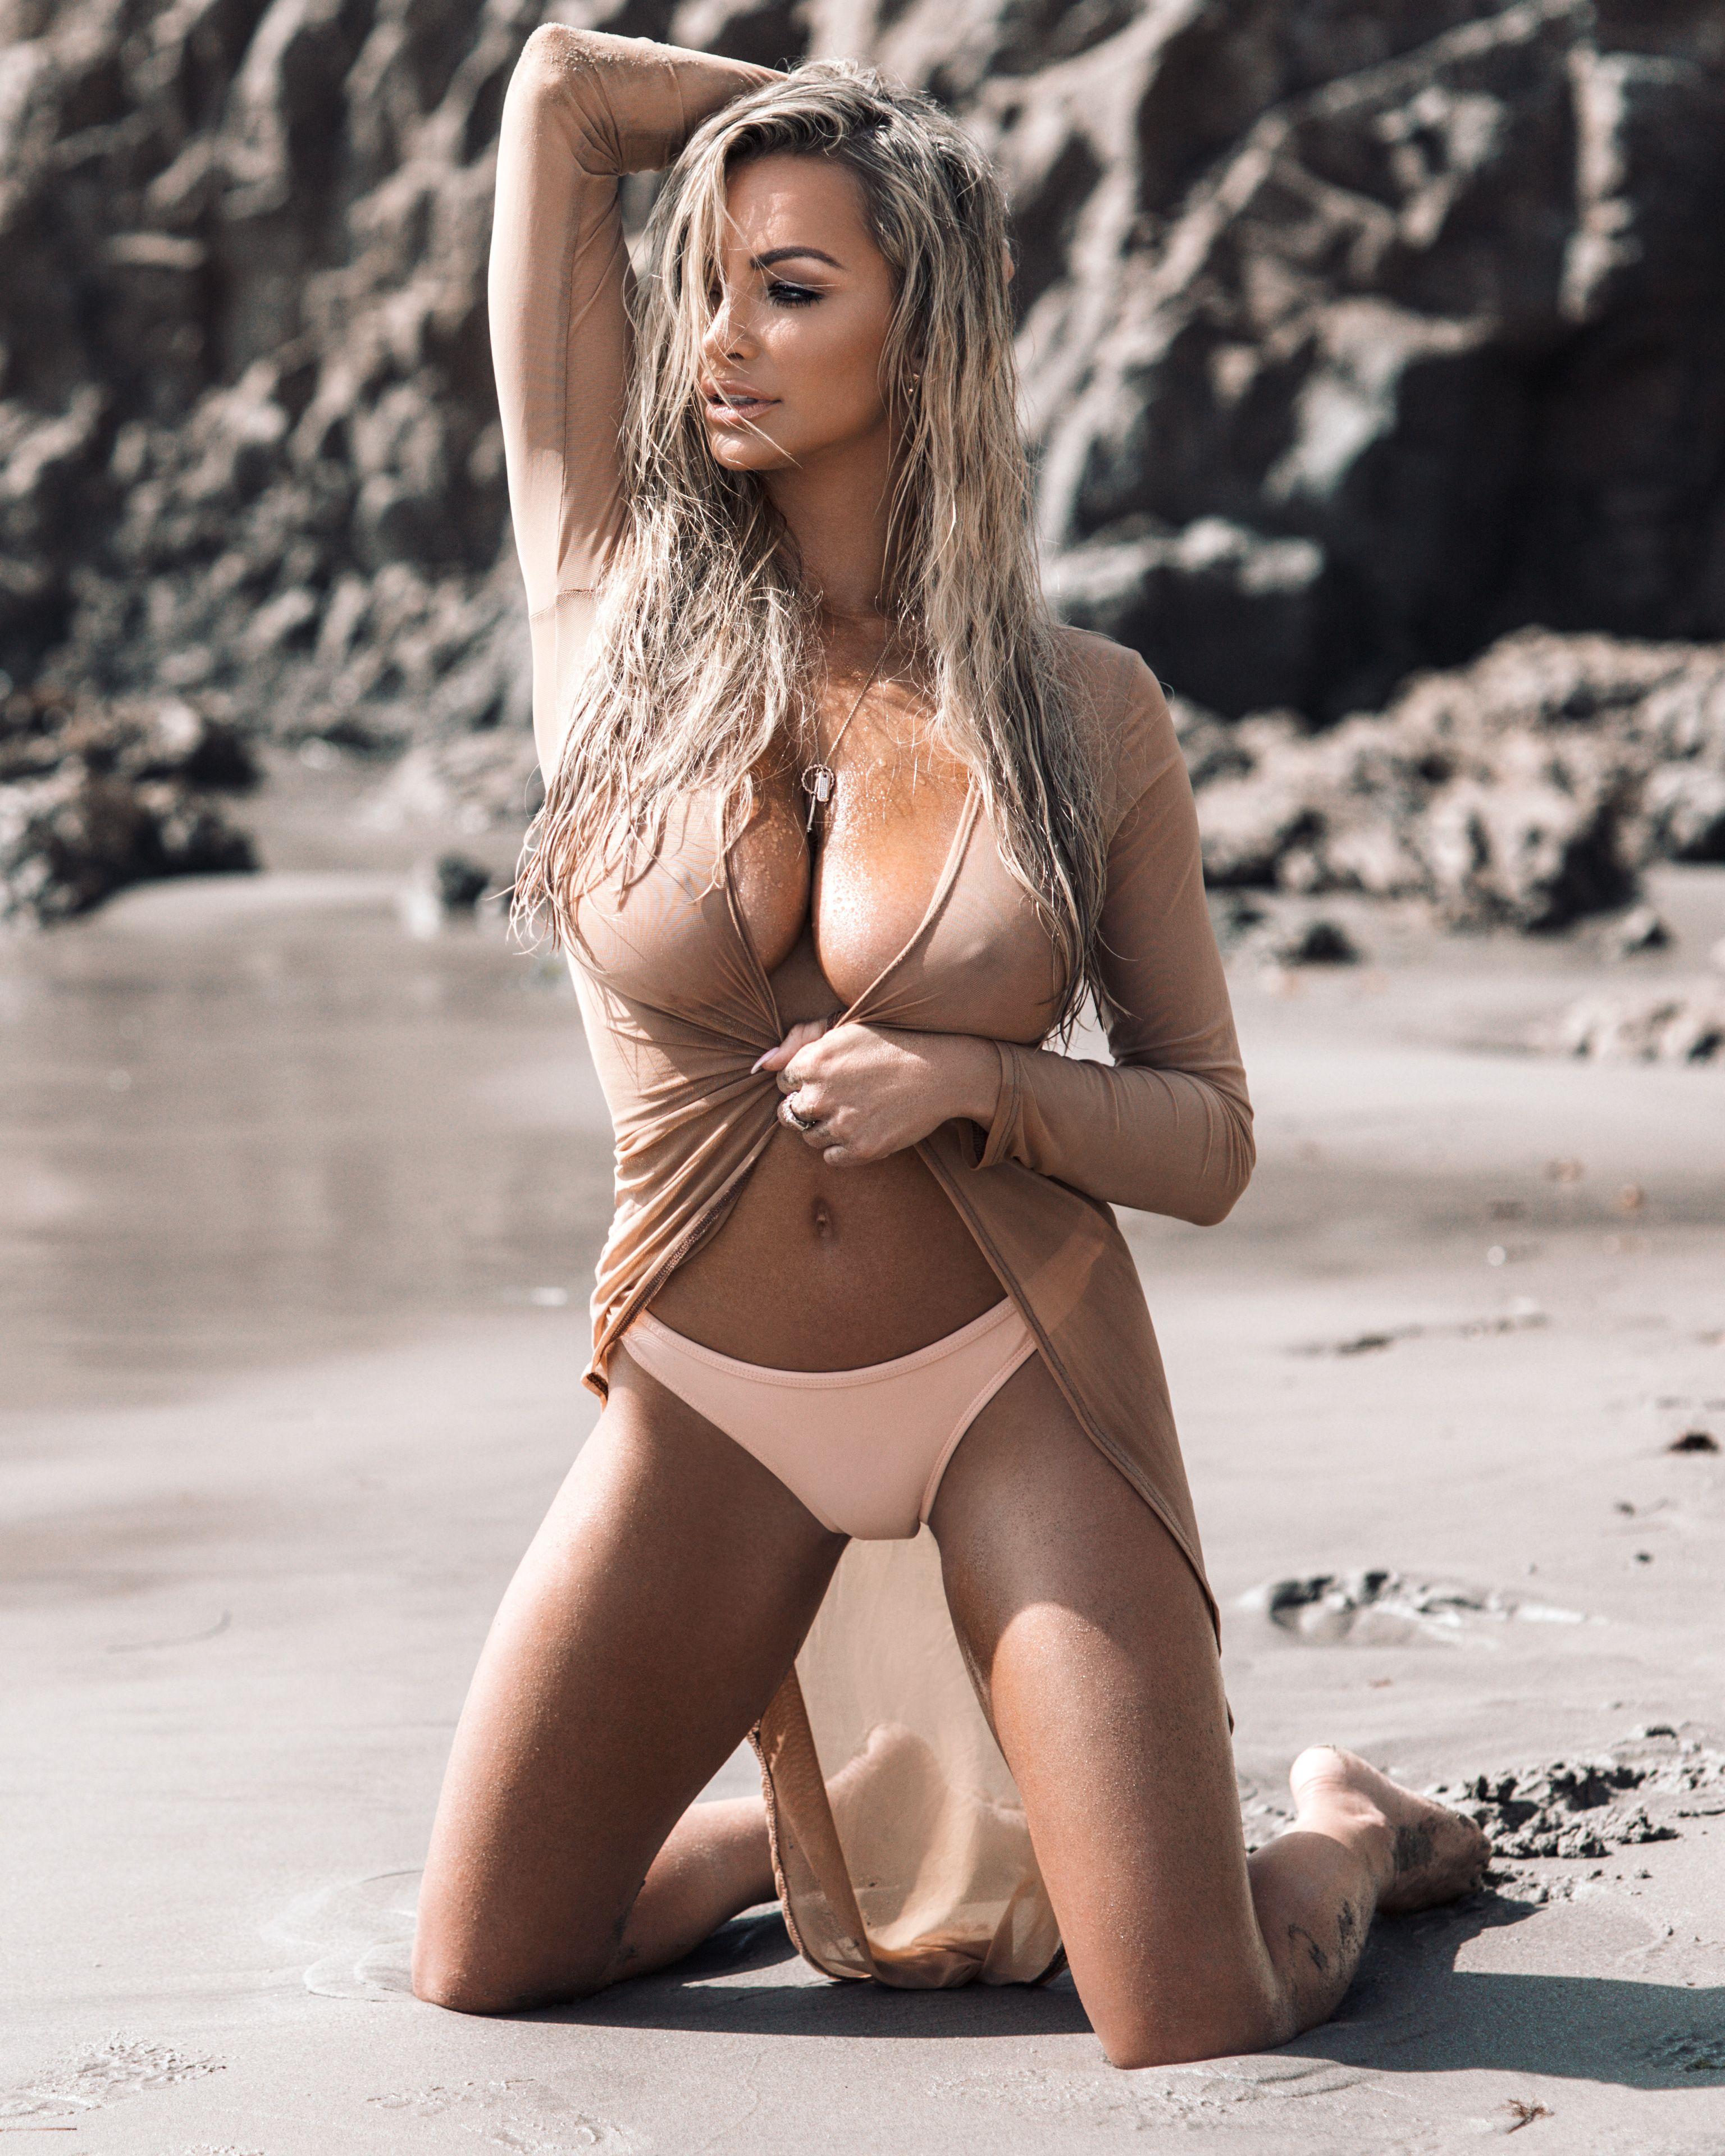 Candid hottie braless amp sexy oct 2016 - 3 part 2